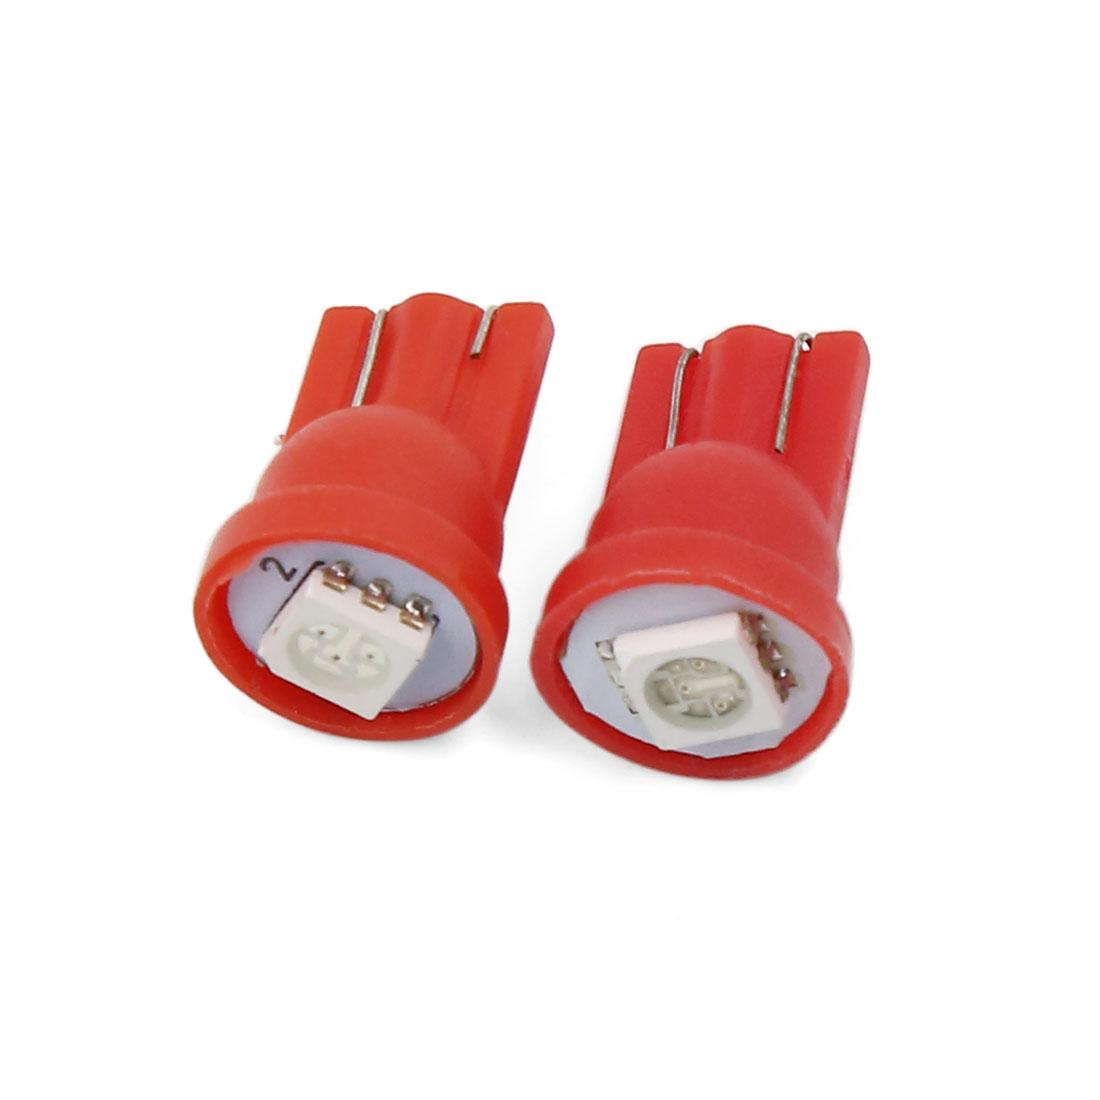 2 Pcs T10 W5W 5050 SMD 1-LED Bulbs Car Backup Reverse Light Lamp Red Interior